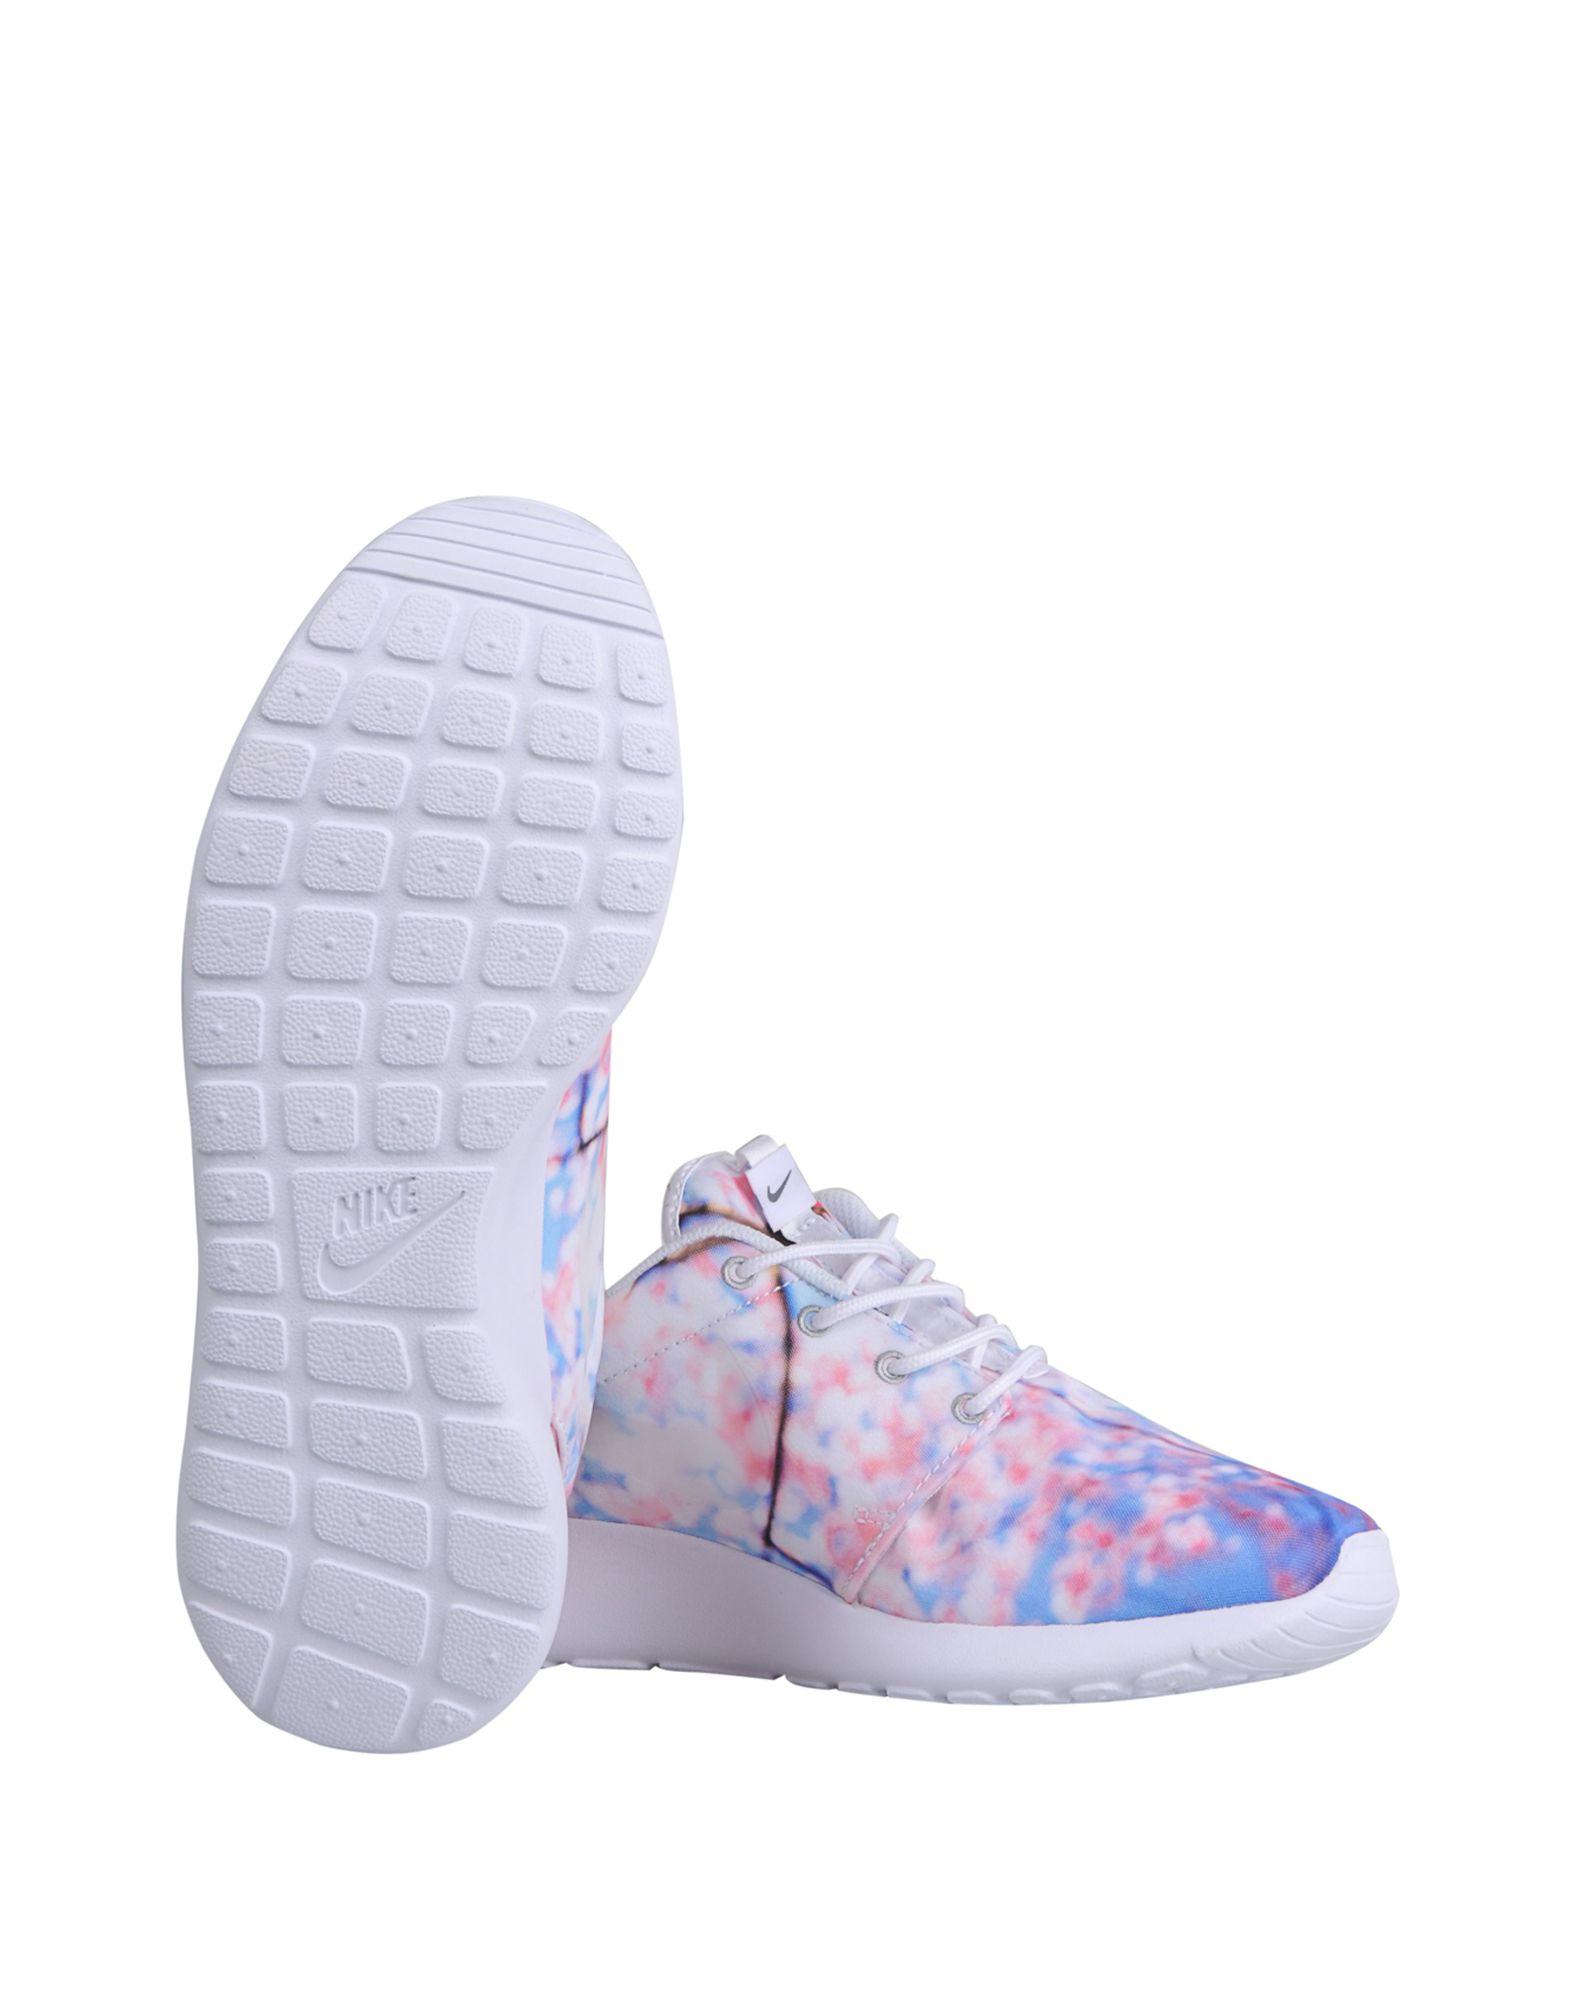 Nike Wmns Nike Roshe One Cherry Bls  Schuhe 11024464AH Gute Qualität beliebte Schuhe  df126f